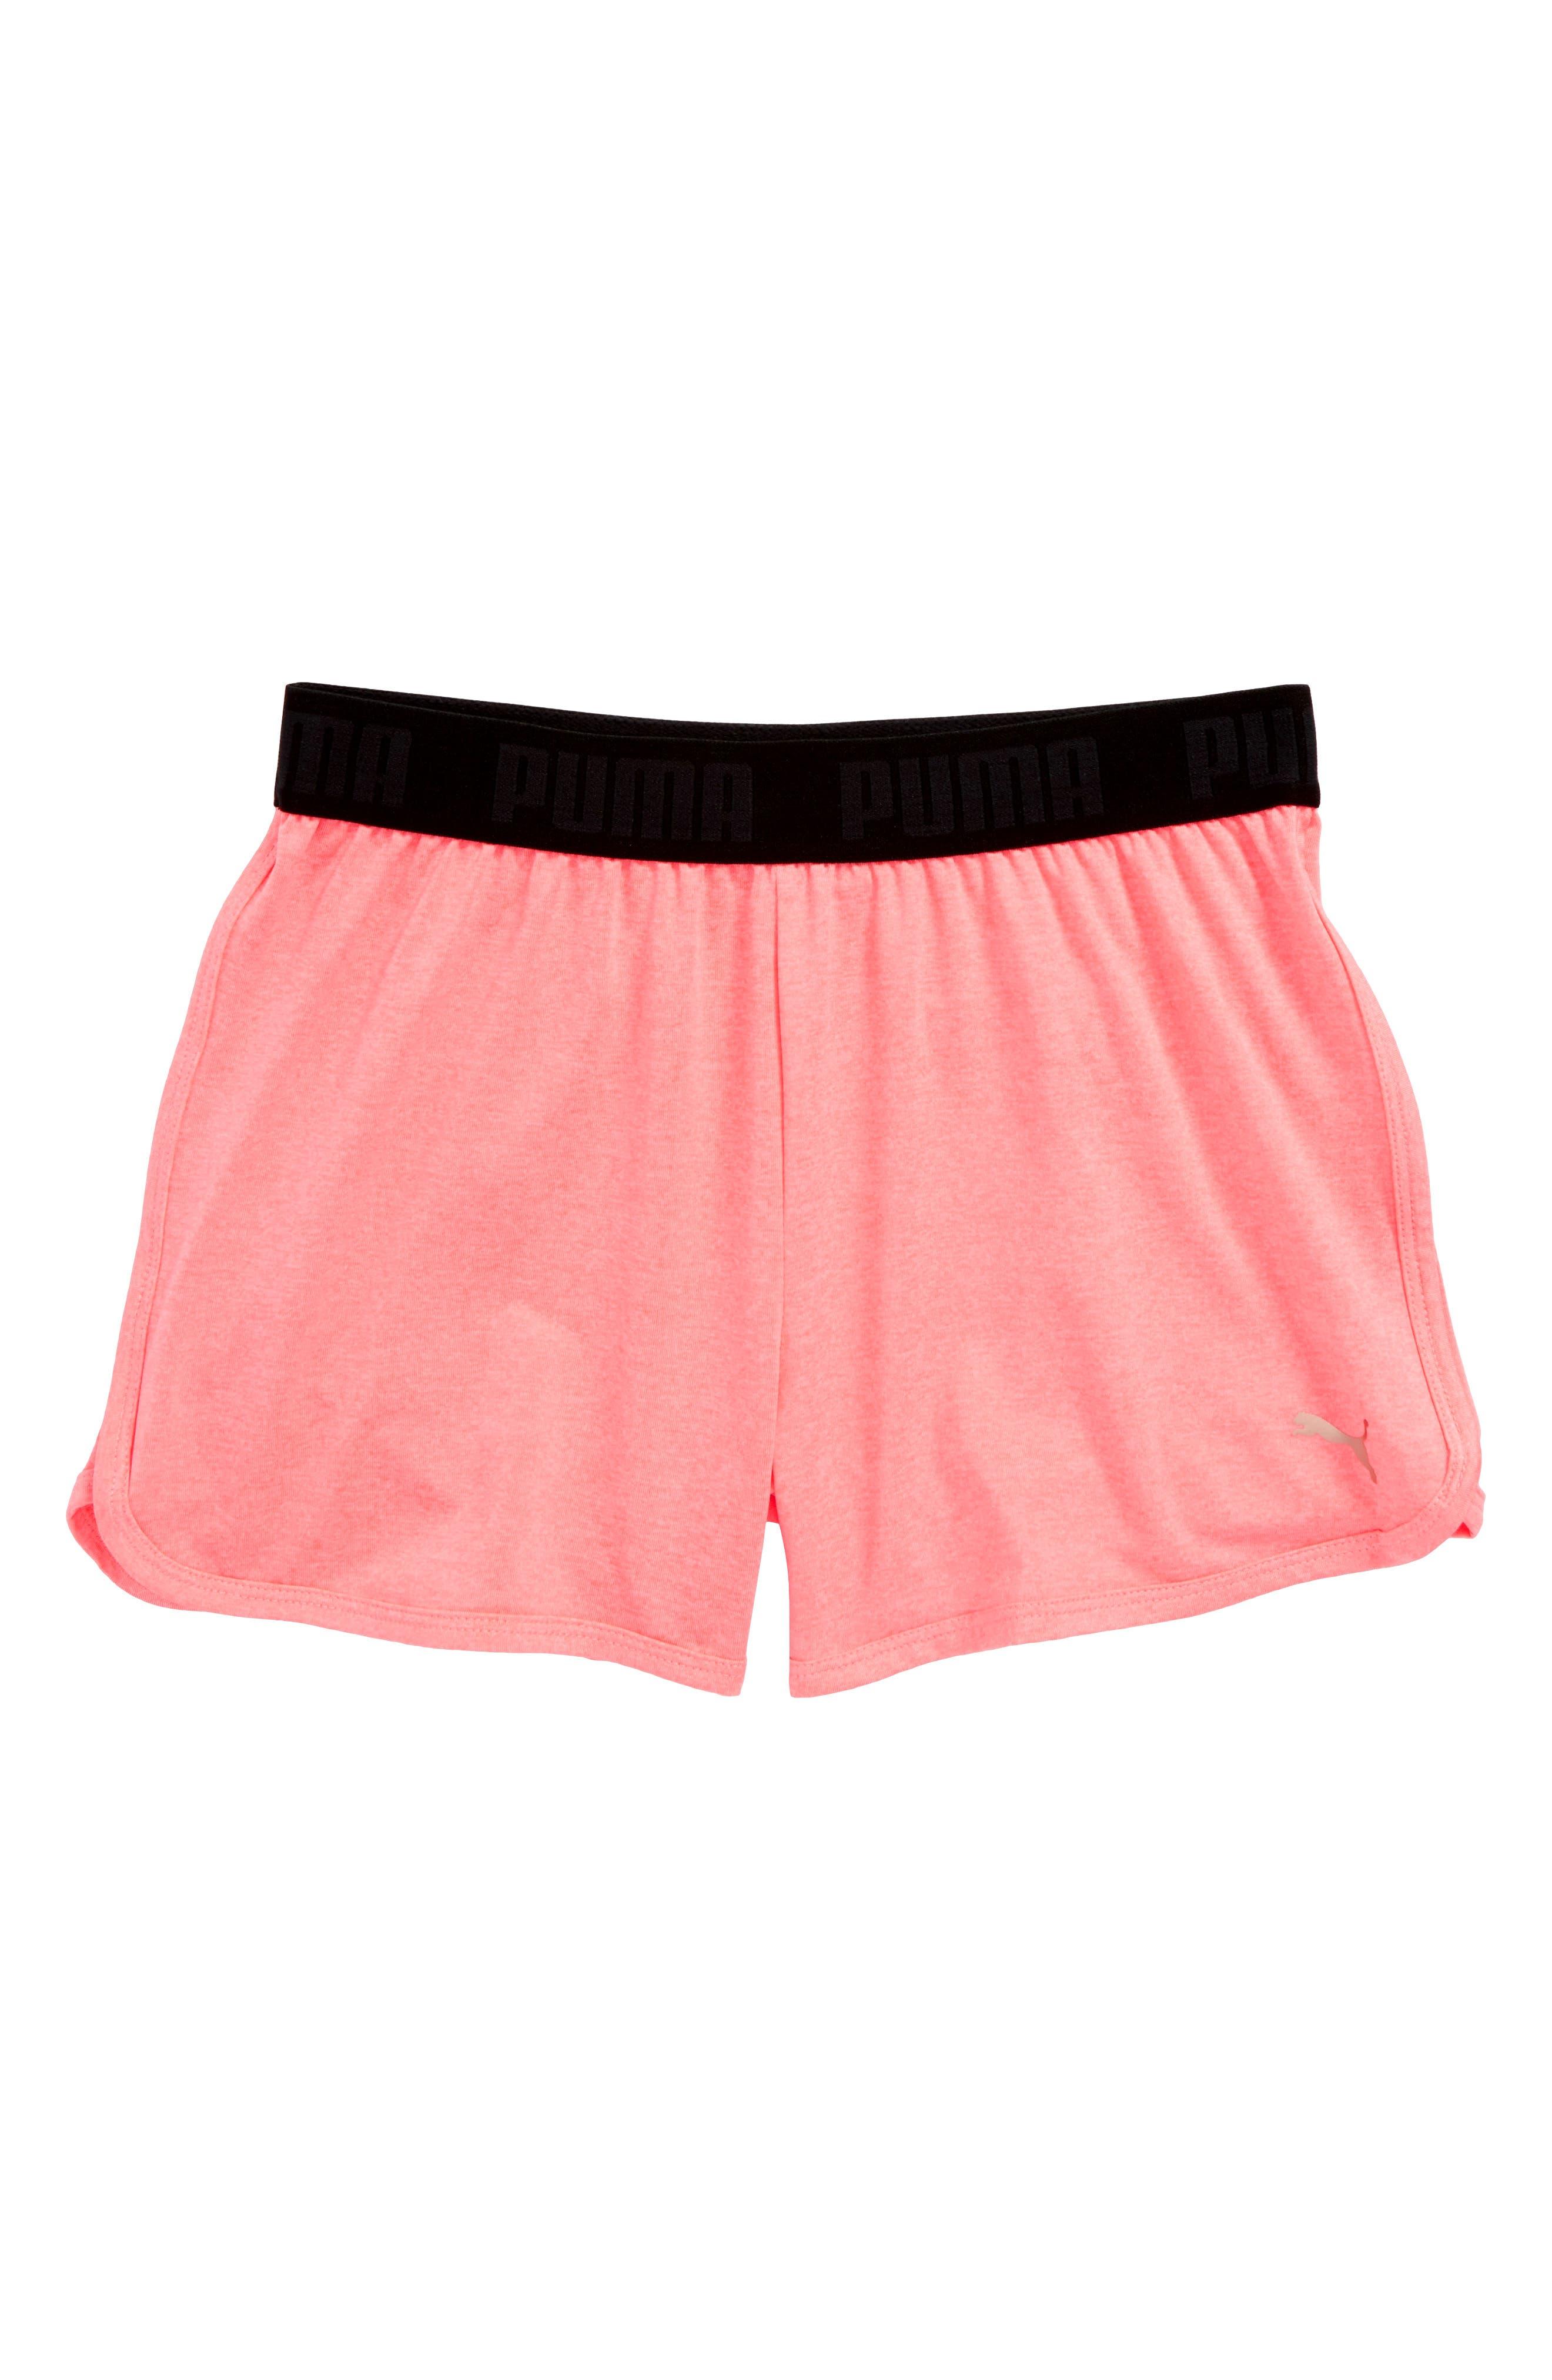 Logo Sport Shorts,                             Main thumbnail 1, color,                             Soft Flu Peach Heather